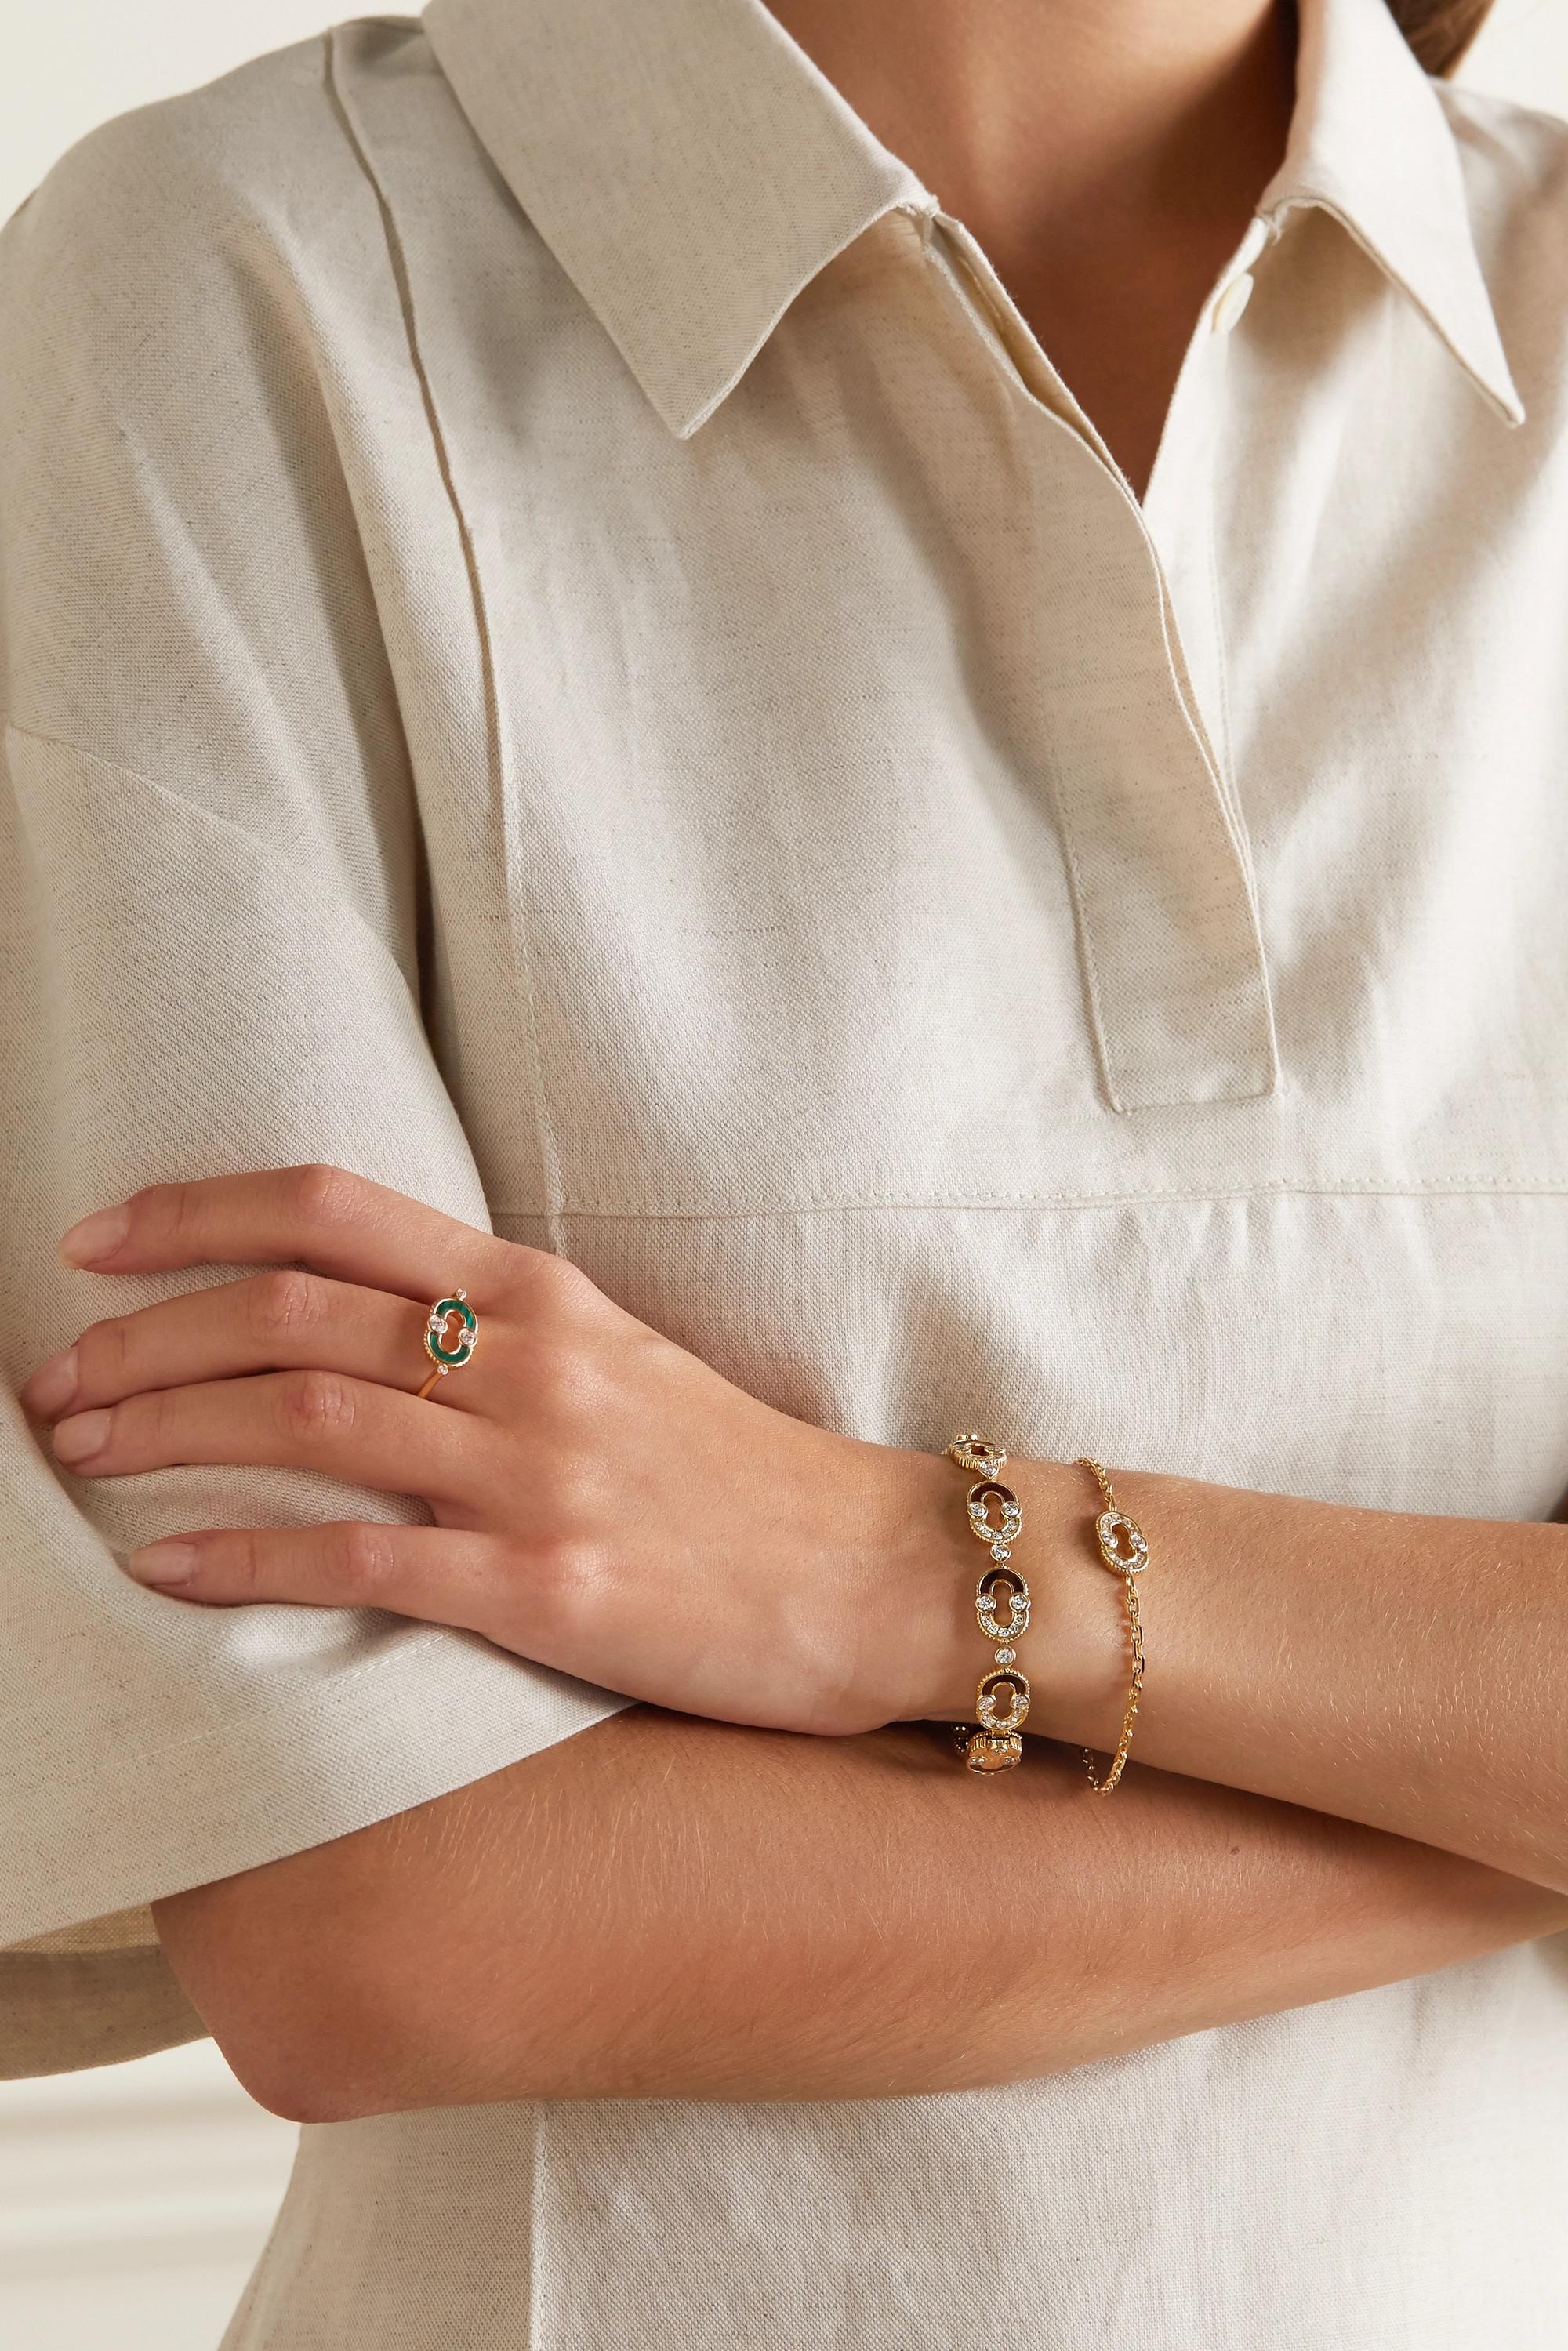 Viltier + NET SUSTAIN Magnetic Etreinte 18-karat gold, diamond and bull's eye bracelet